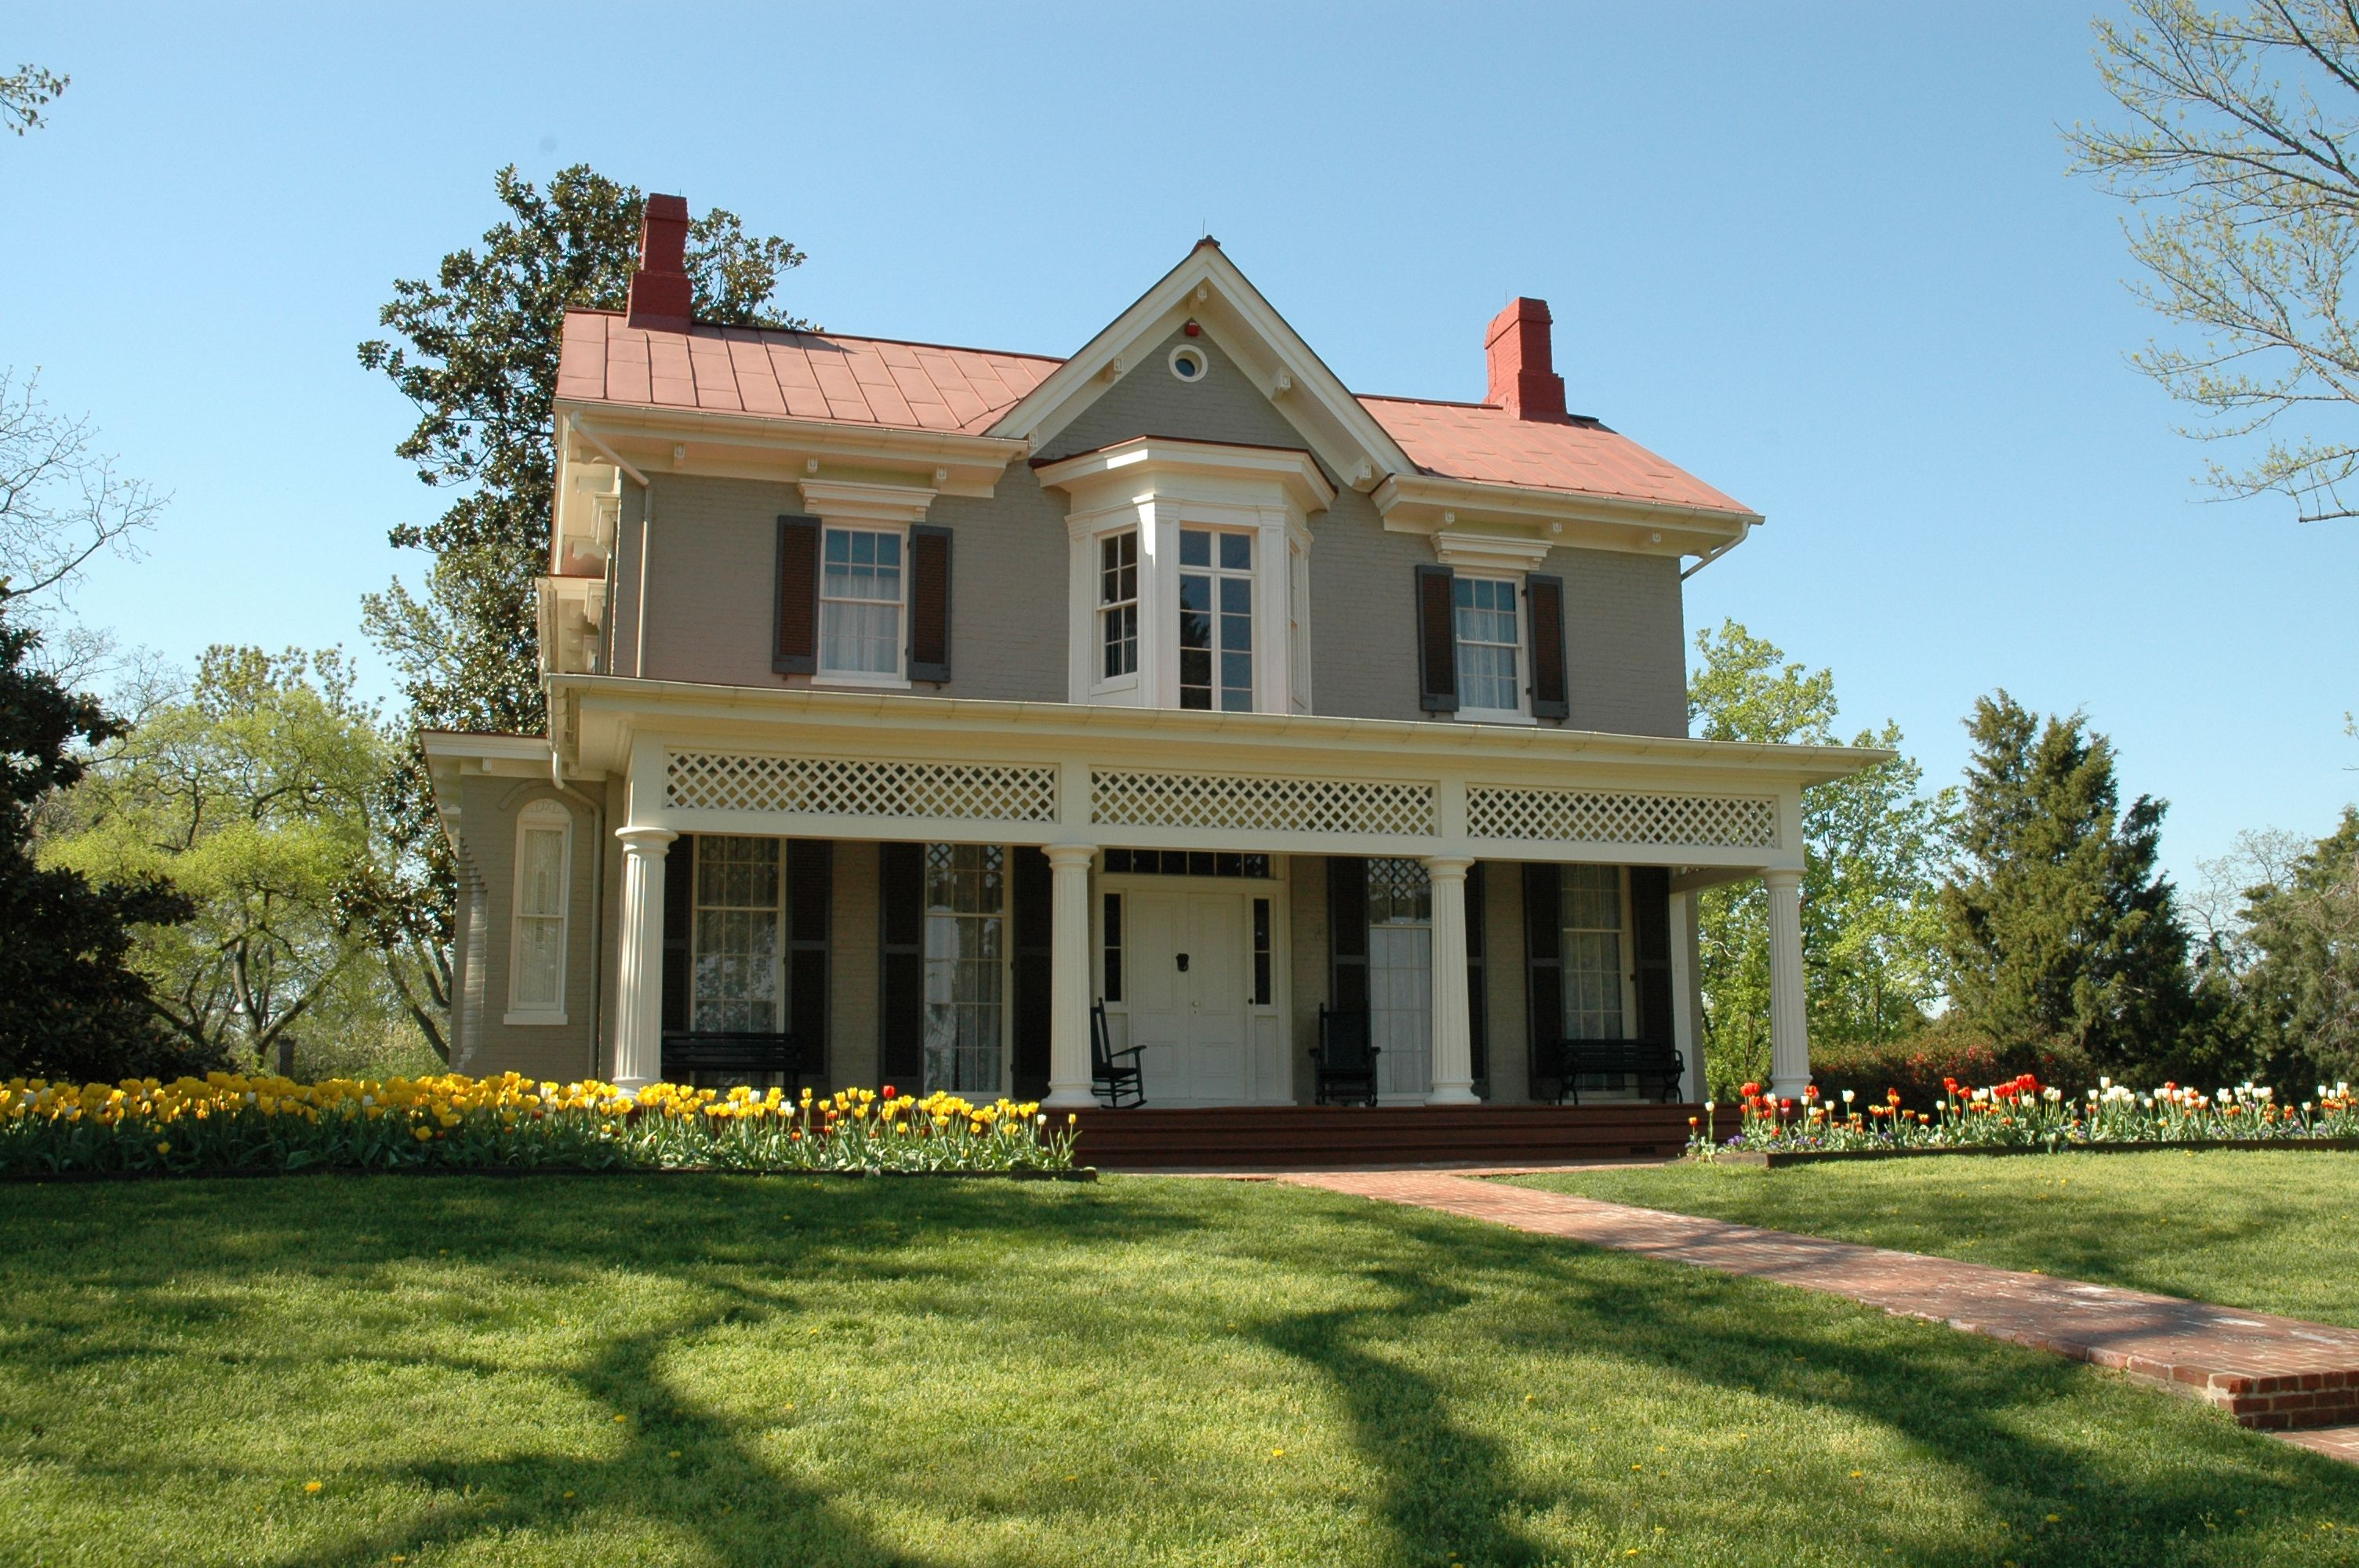 Frederick douglass national historic site washington dc for Fredrick house